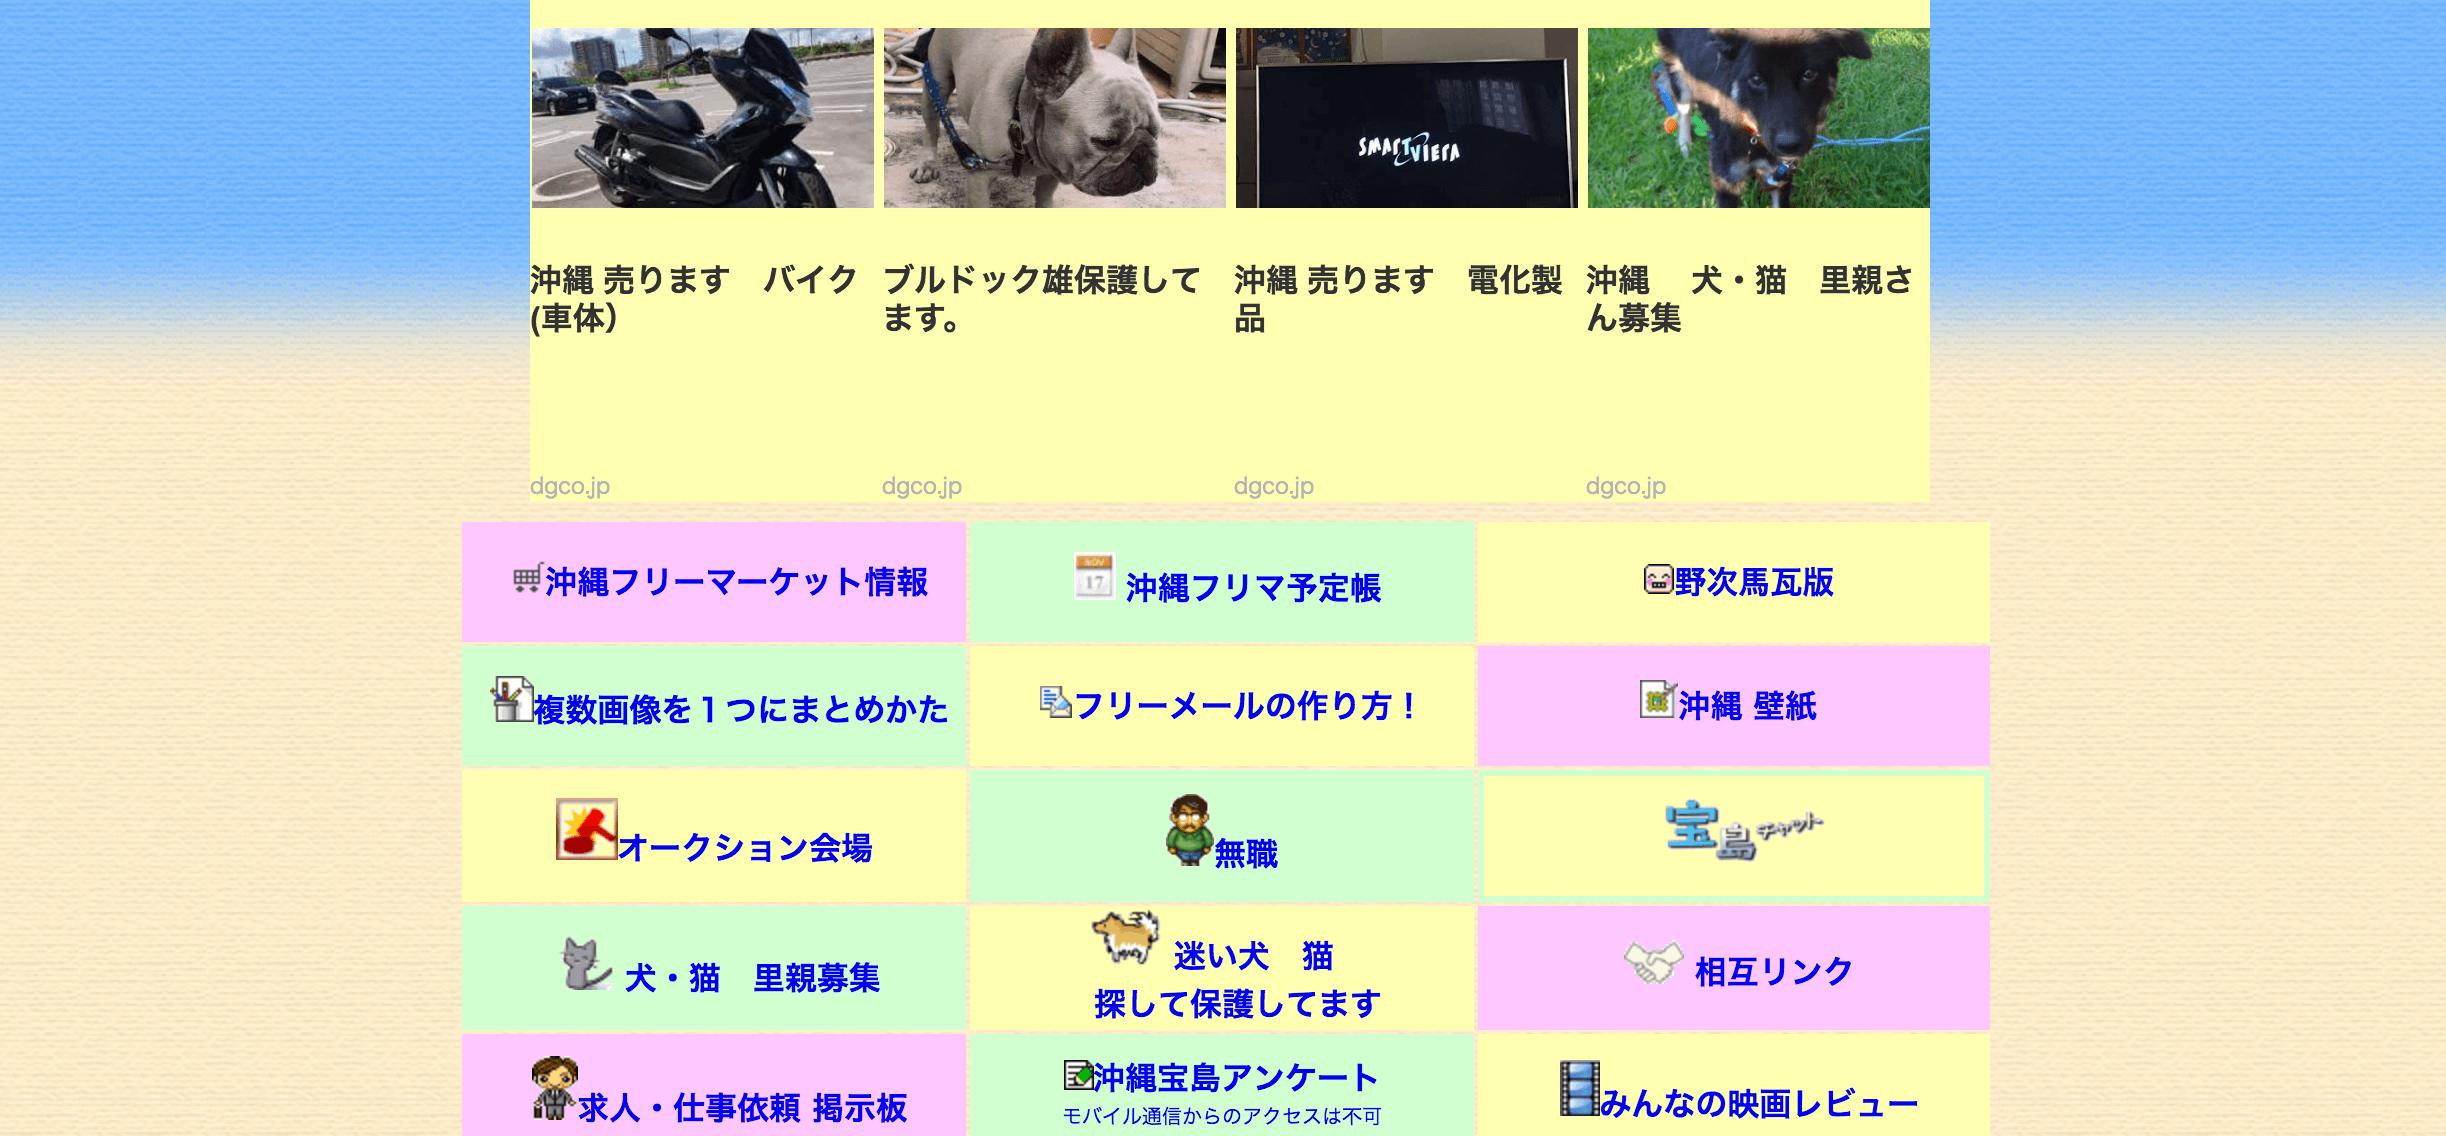 hooter_takarajima_2